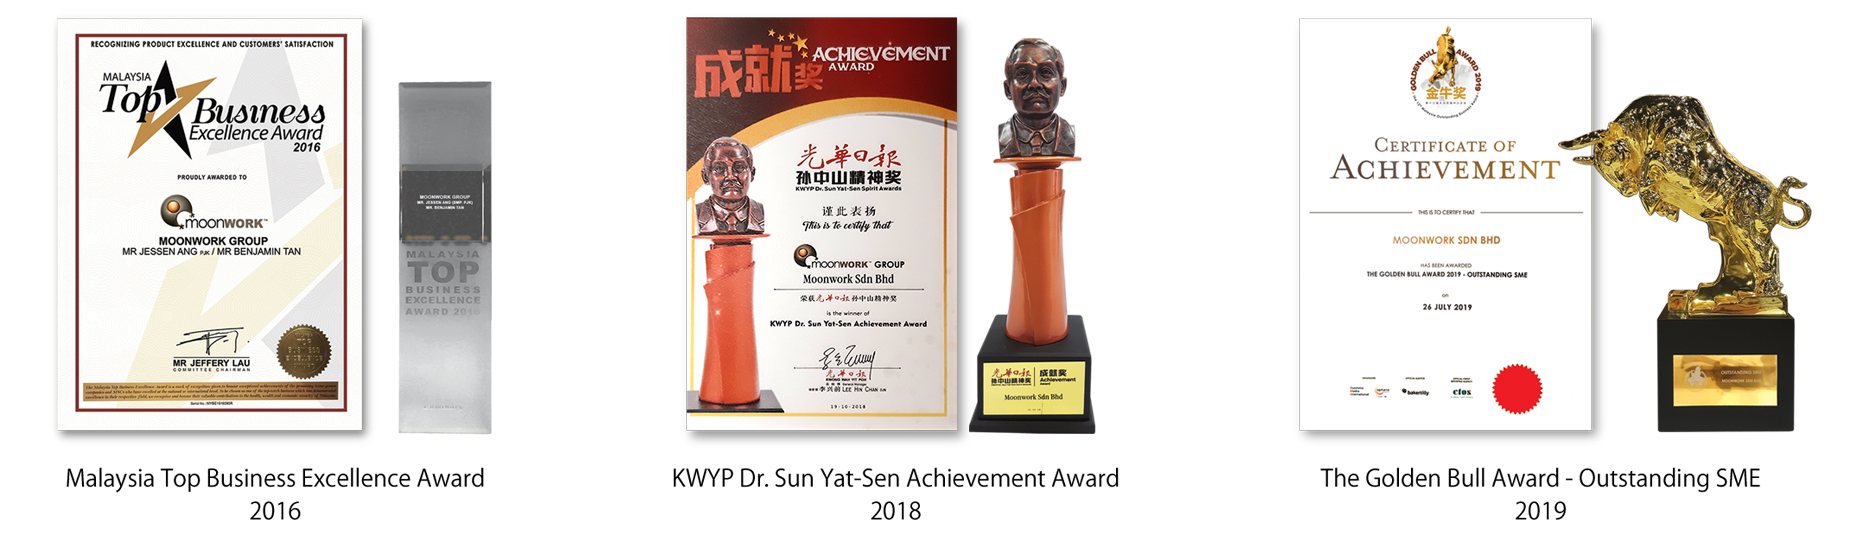 Moonwork Awards